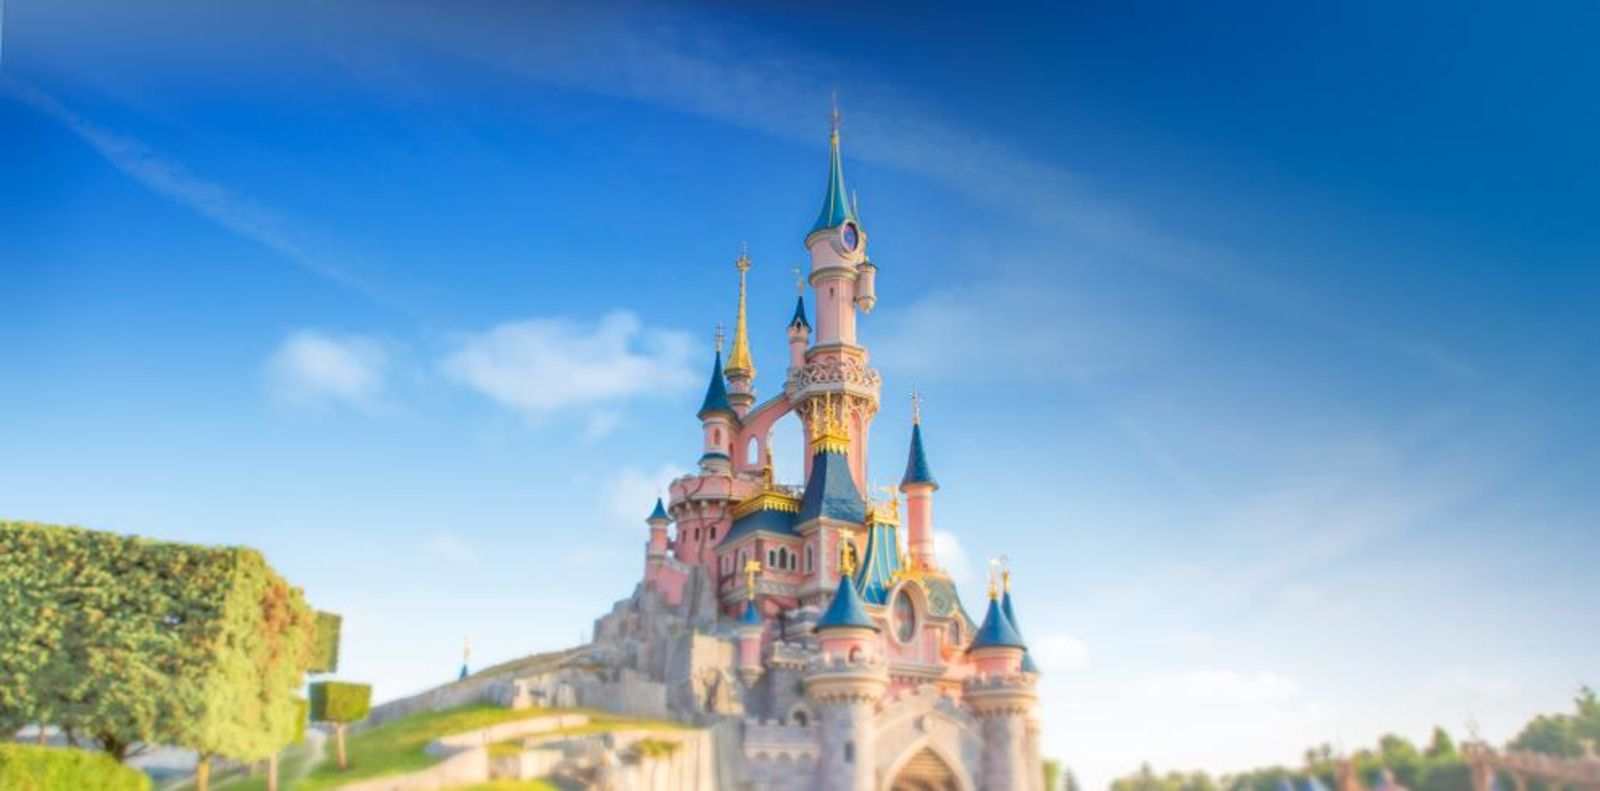 Disneyland Paris, Disneyland Resort Paris, travelcircus